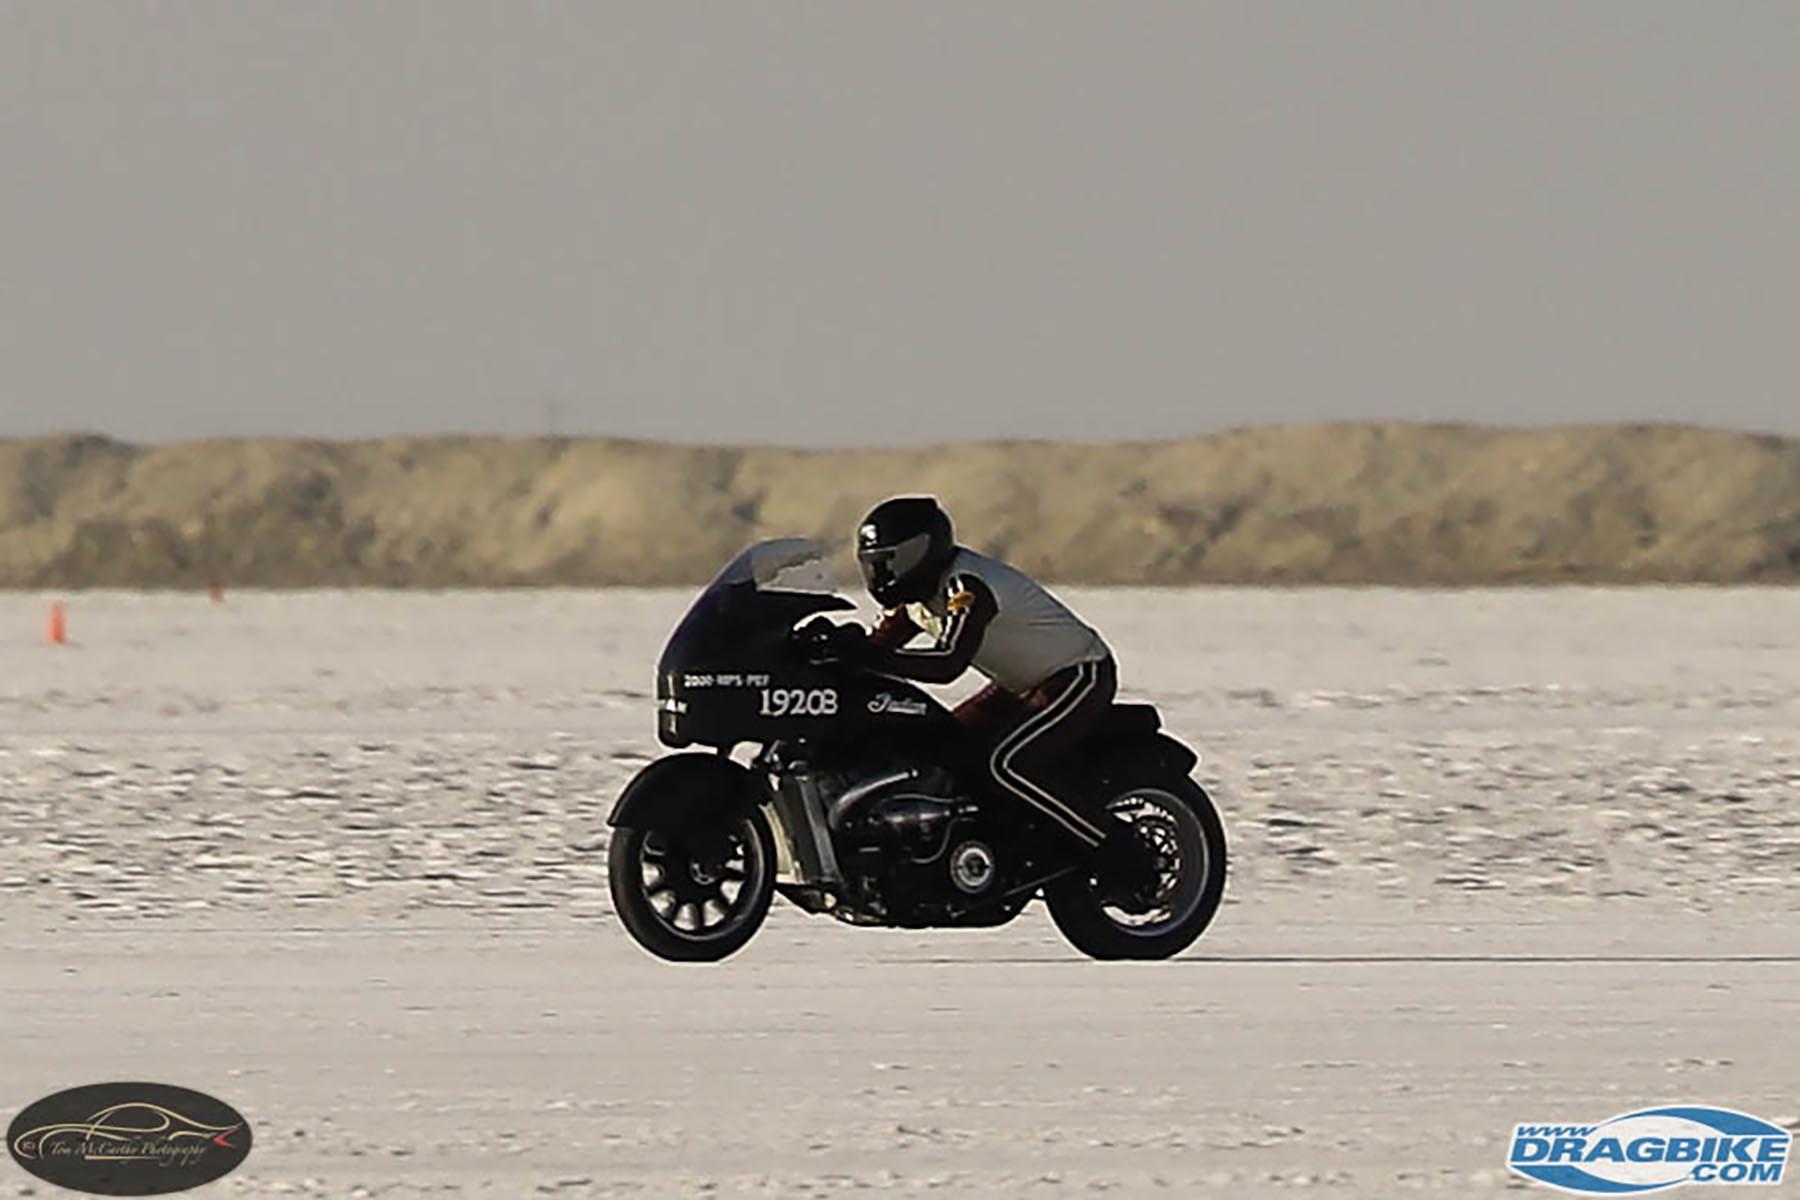 2021 Bonneville Motorcycle Speed Trials